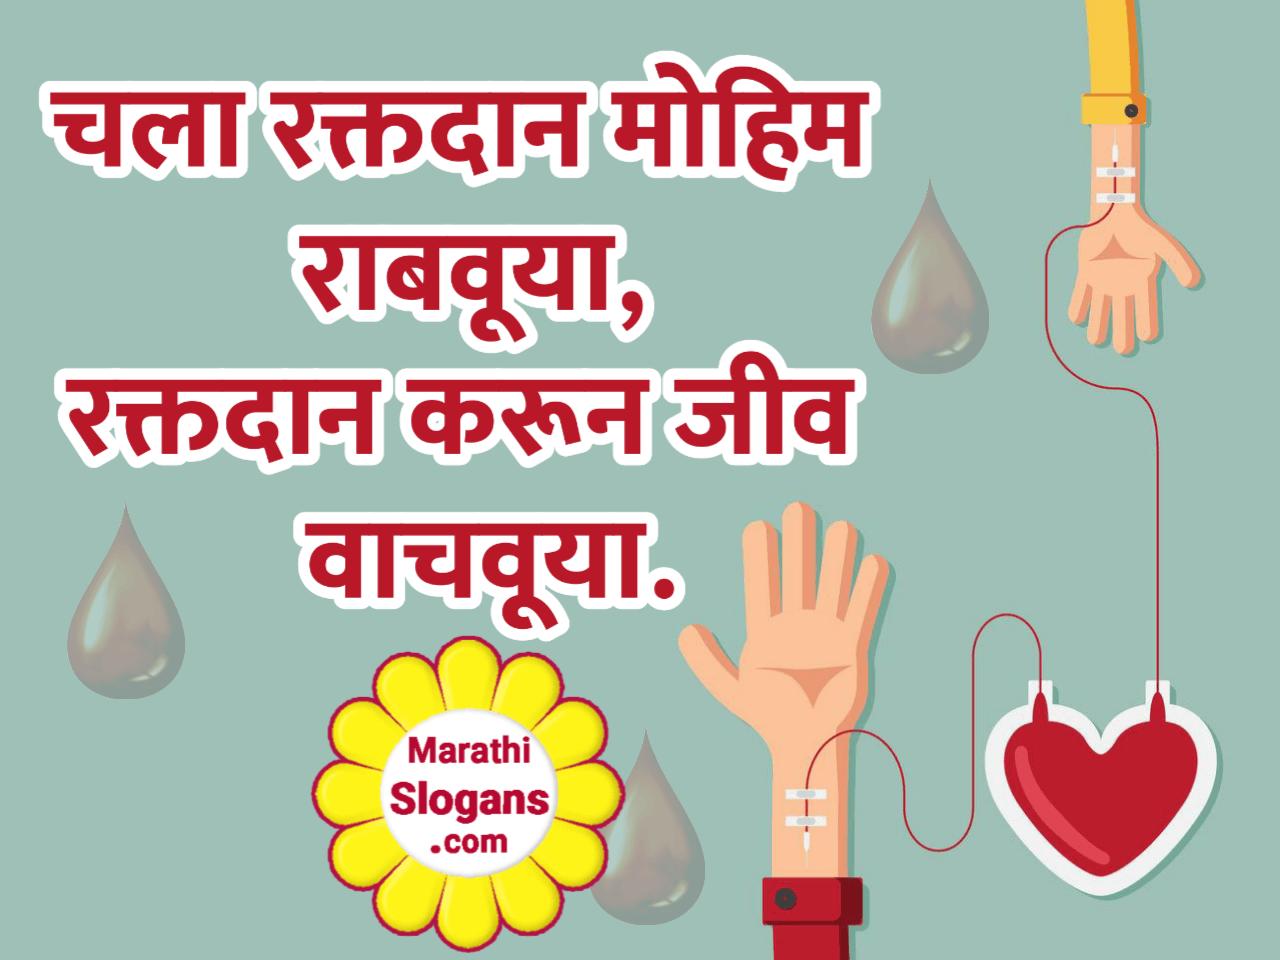 Blood Donation Slogans (रक्तदान घोषवाक्य) in Marathi